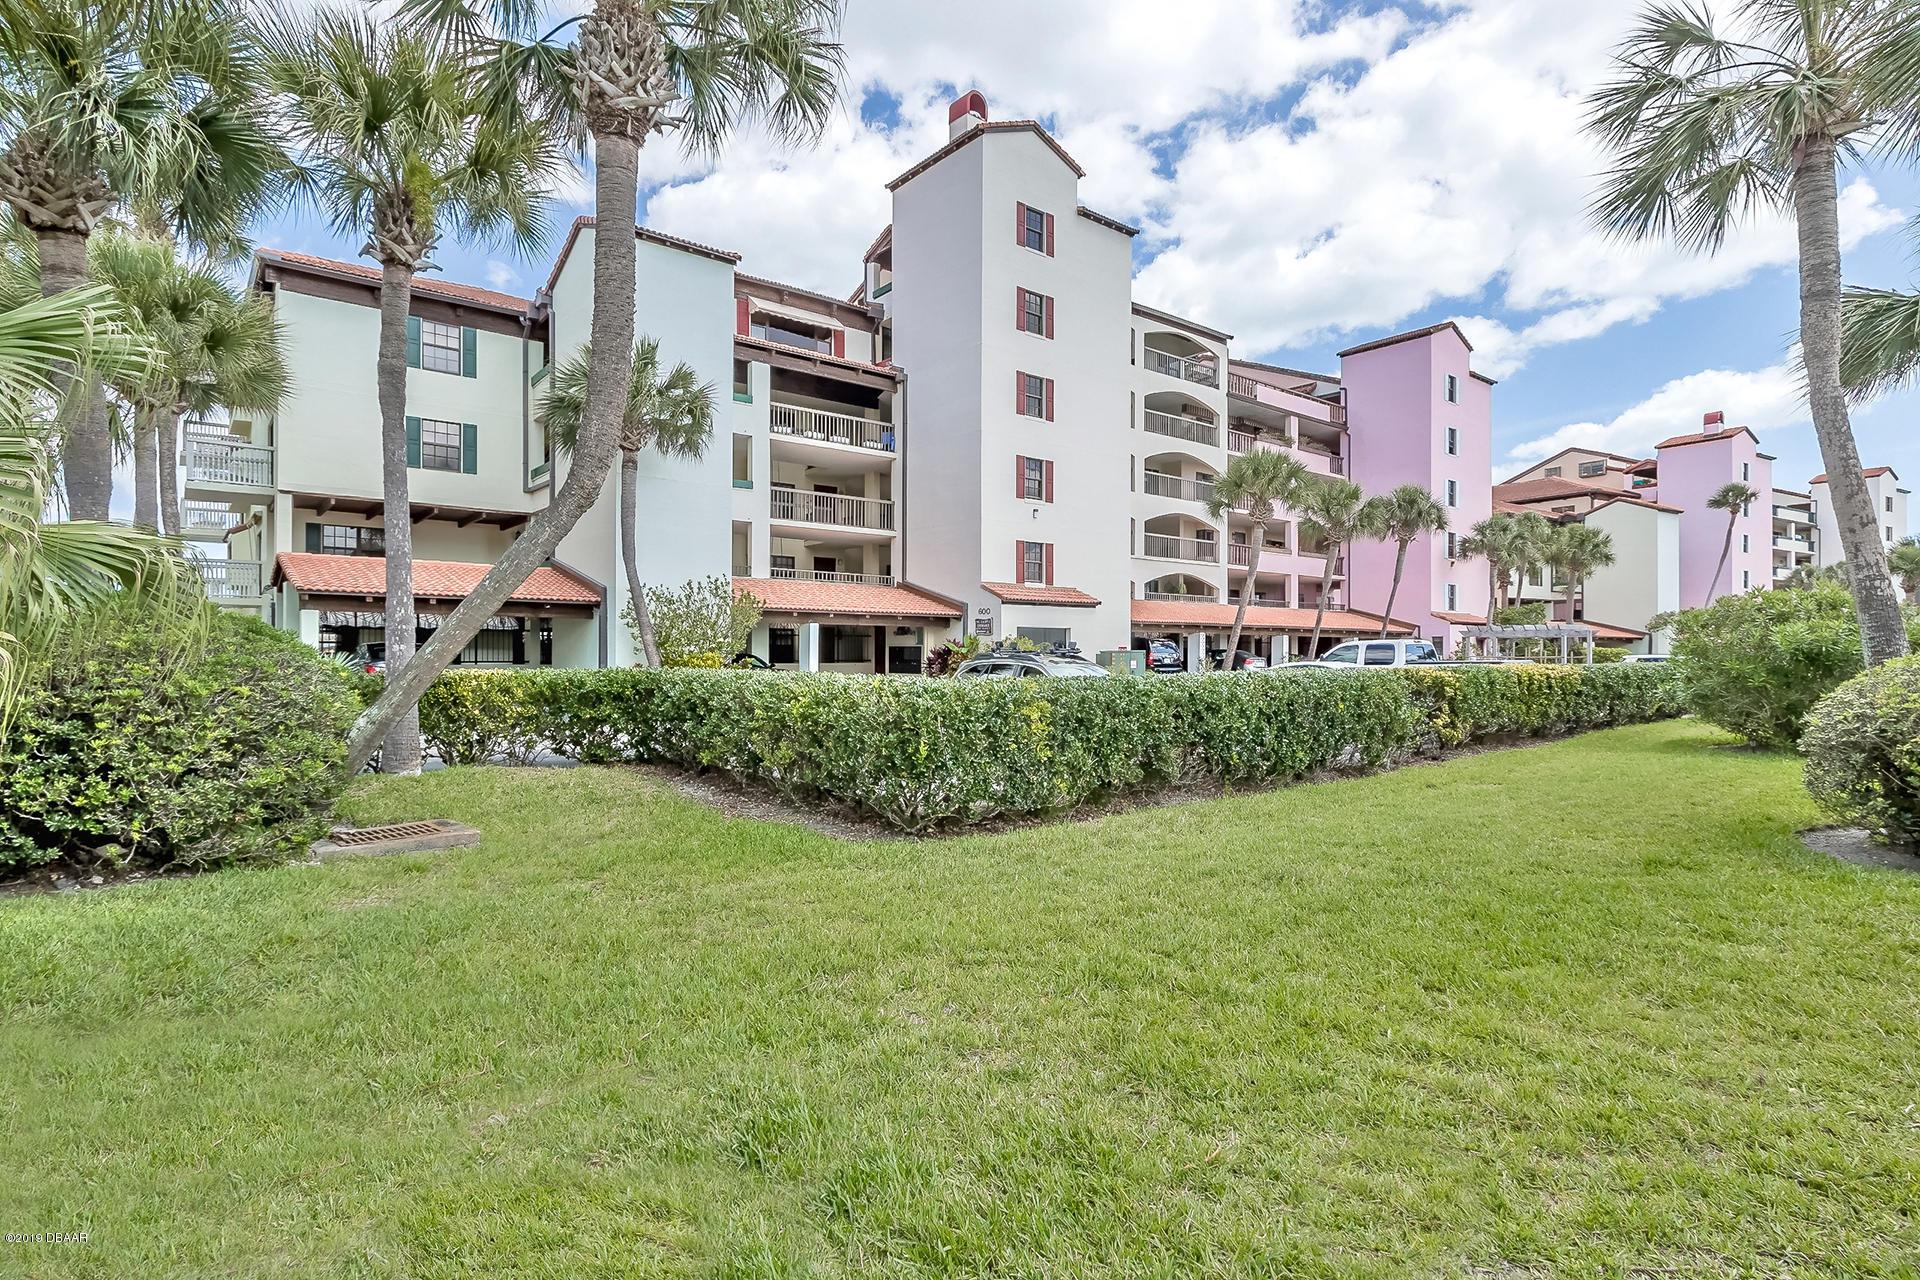 633  Marina Point Drive, Daytona Beach in Volusia County, FL 32114 Home for Sale